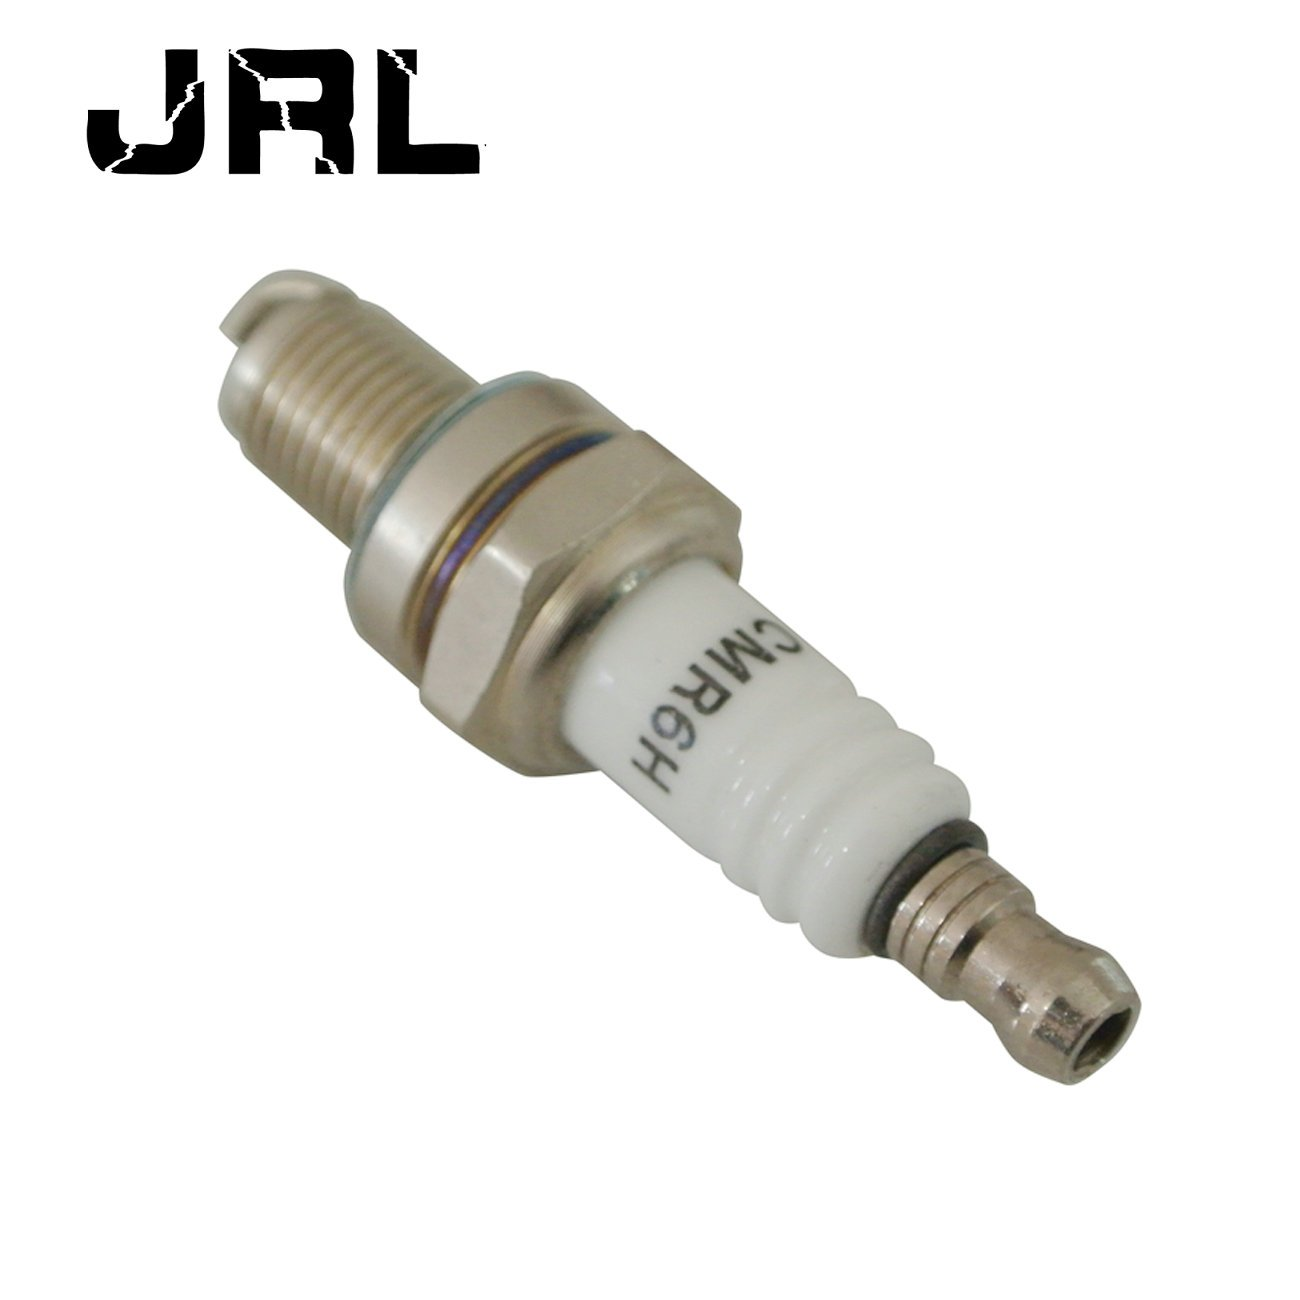 JRL Spark Plug replace CMR6H For STIHL FS90 FS100 FS110 FS130 BR500 BR550 BR600